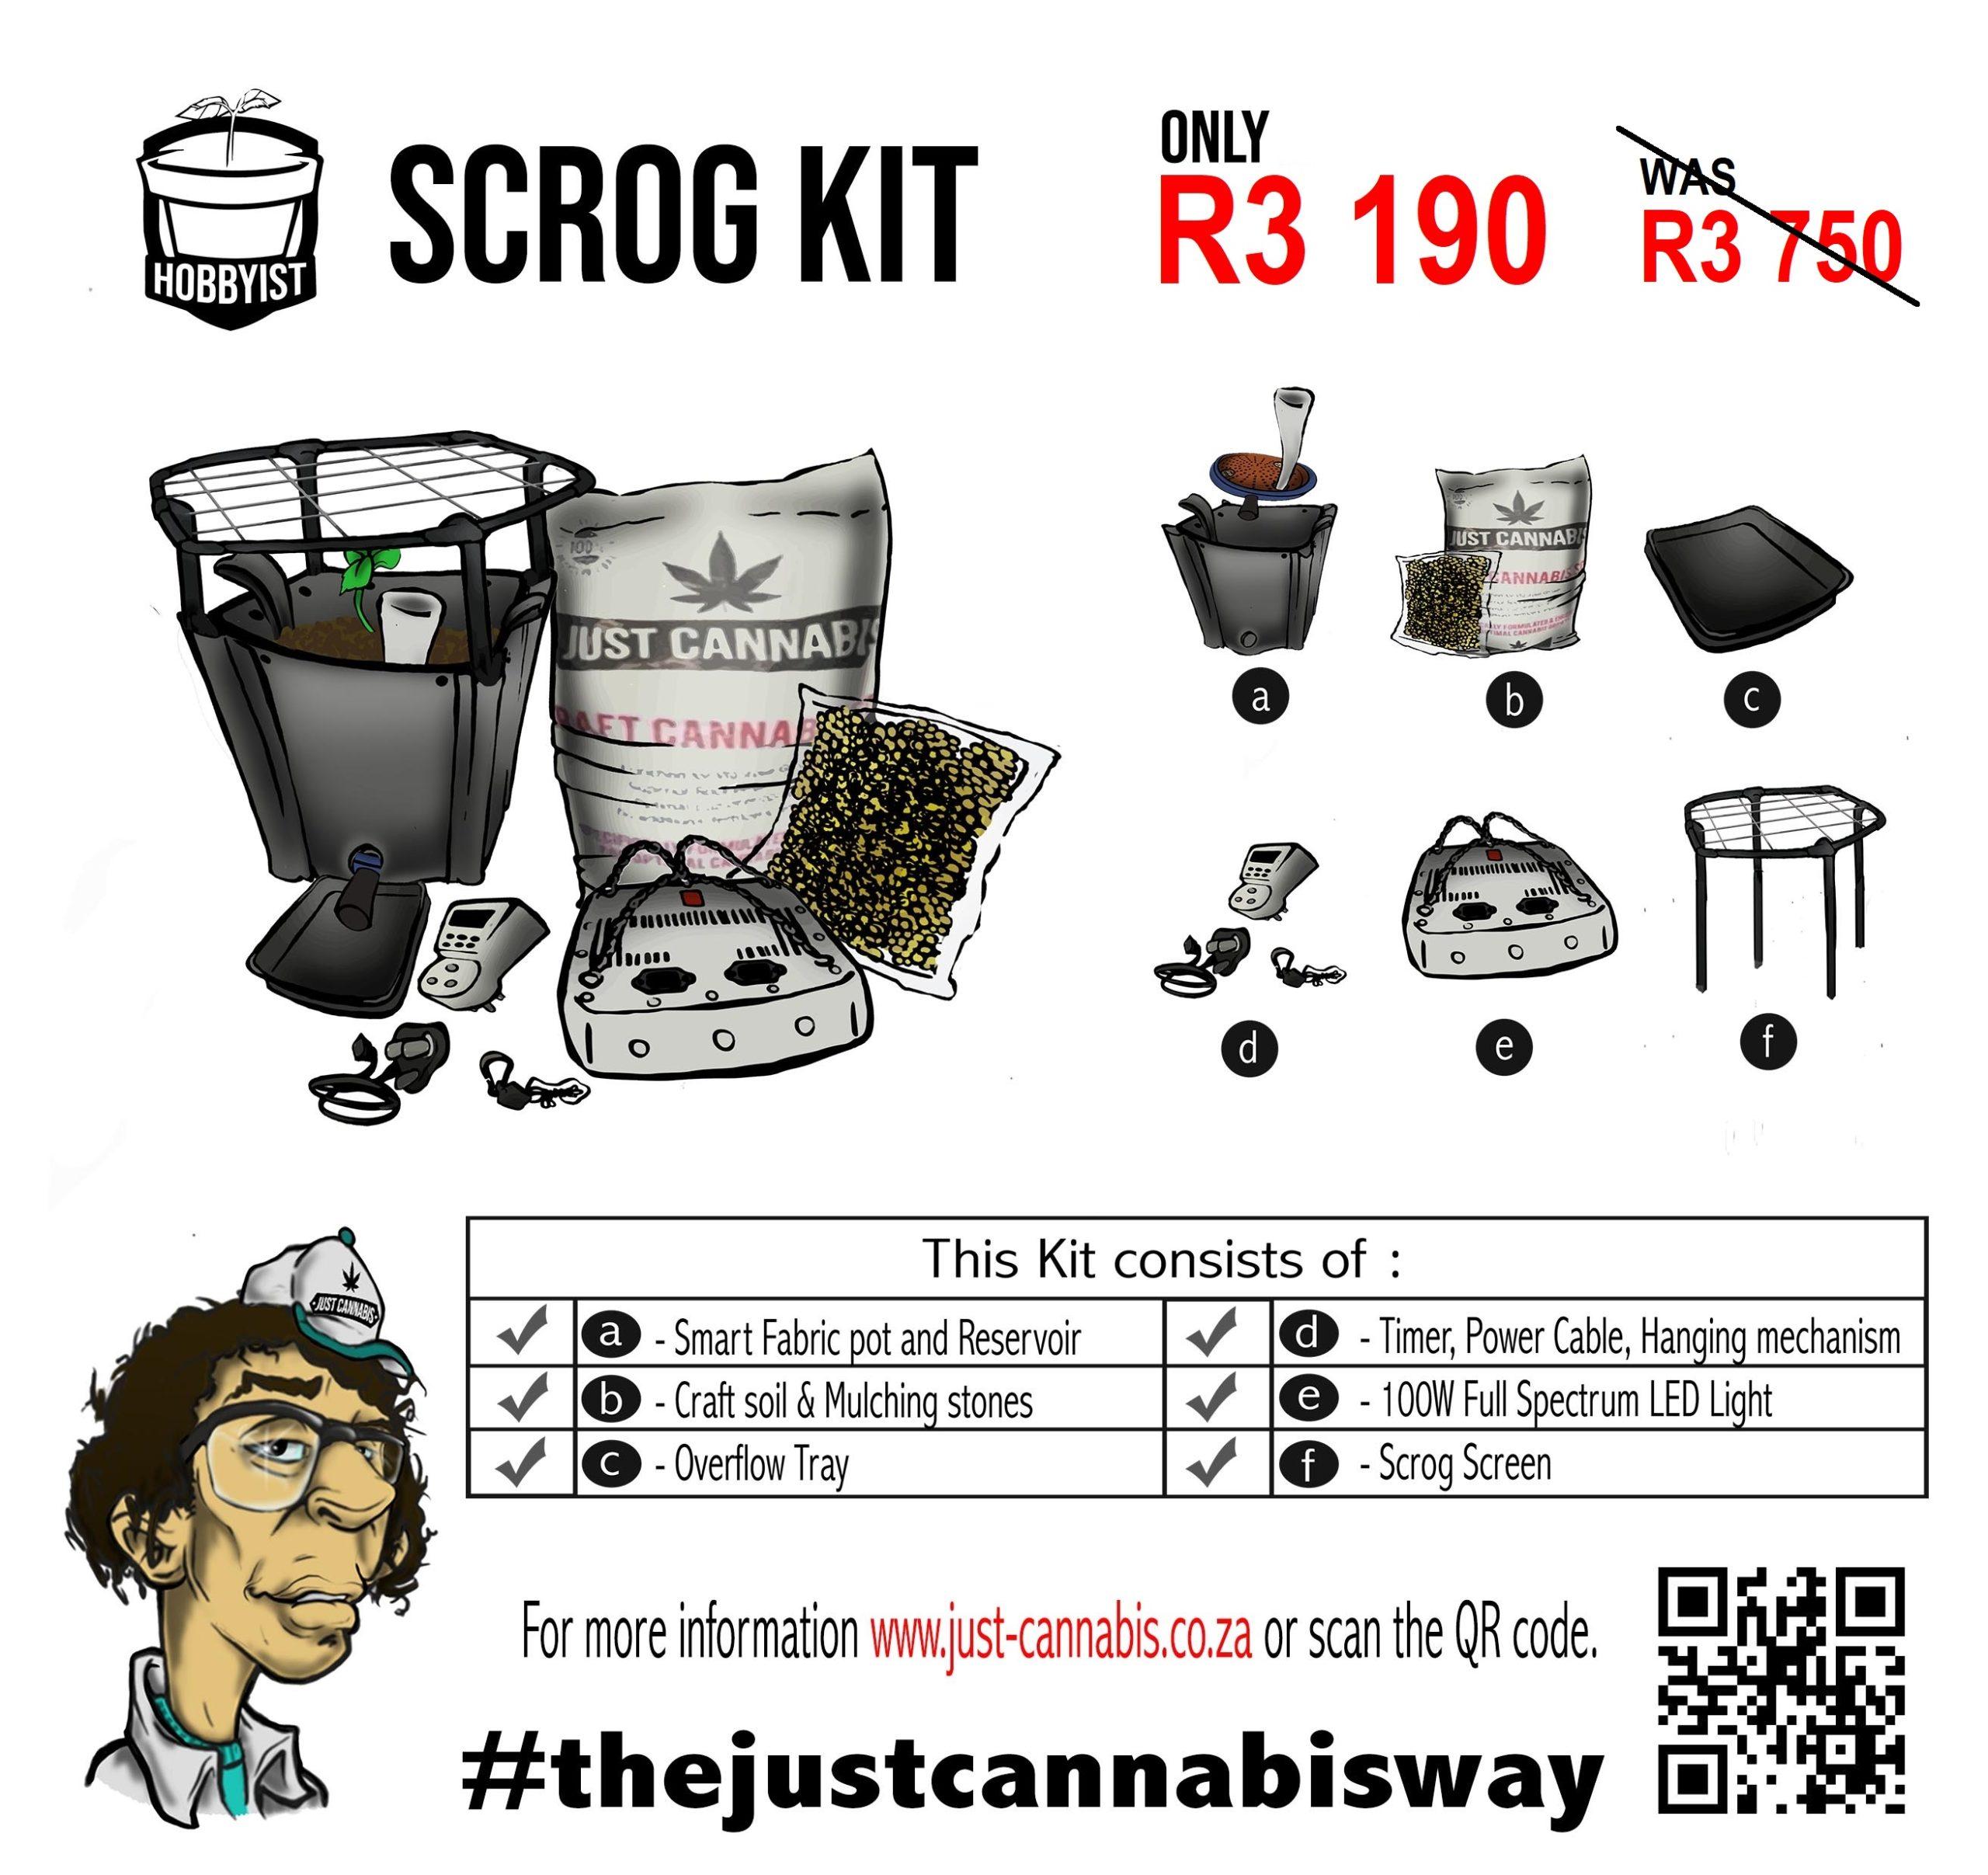 Hobbyist Scrog Kit